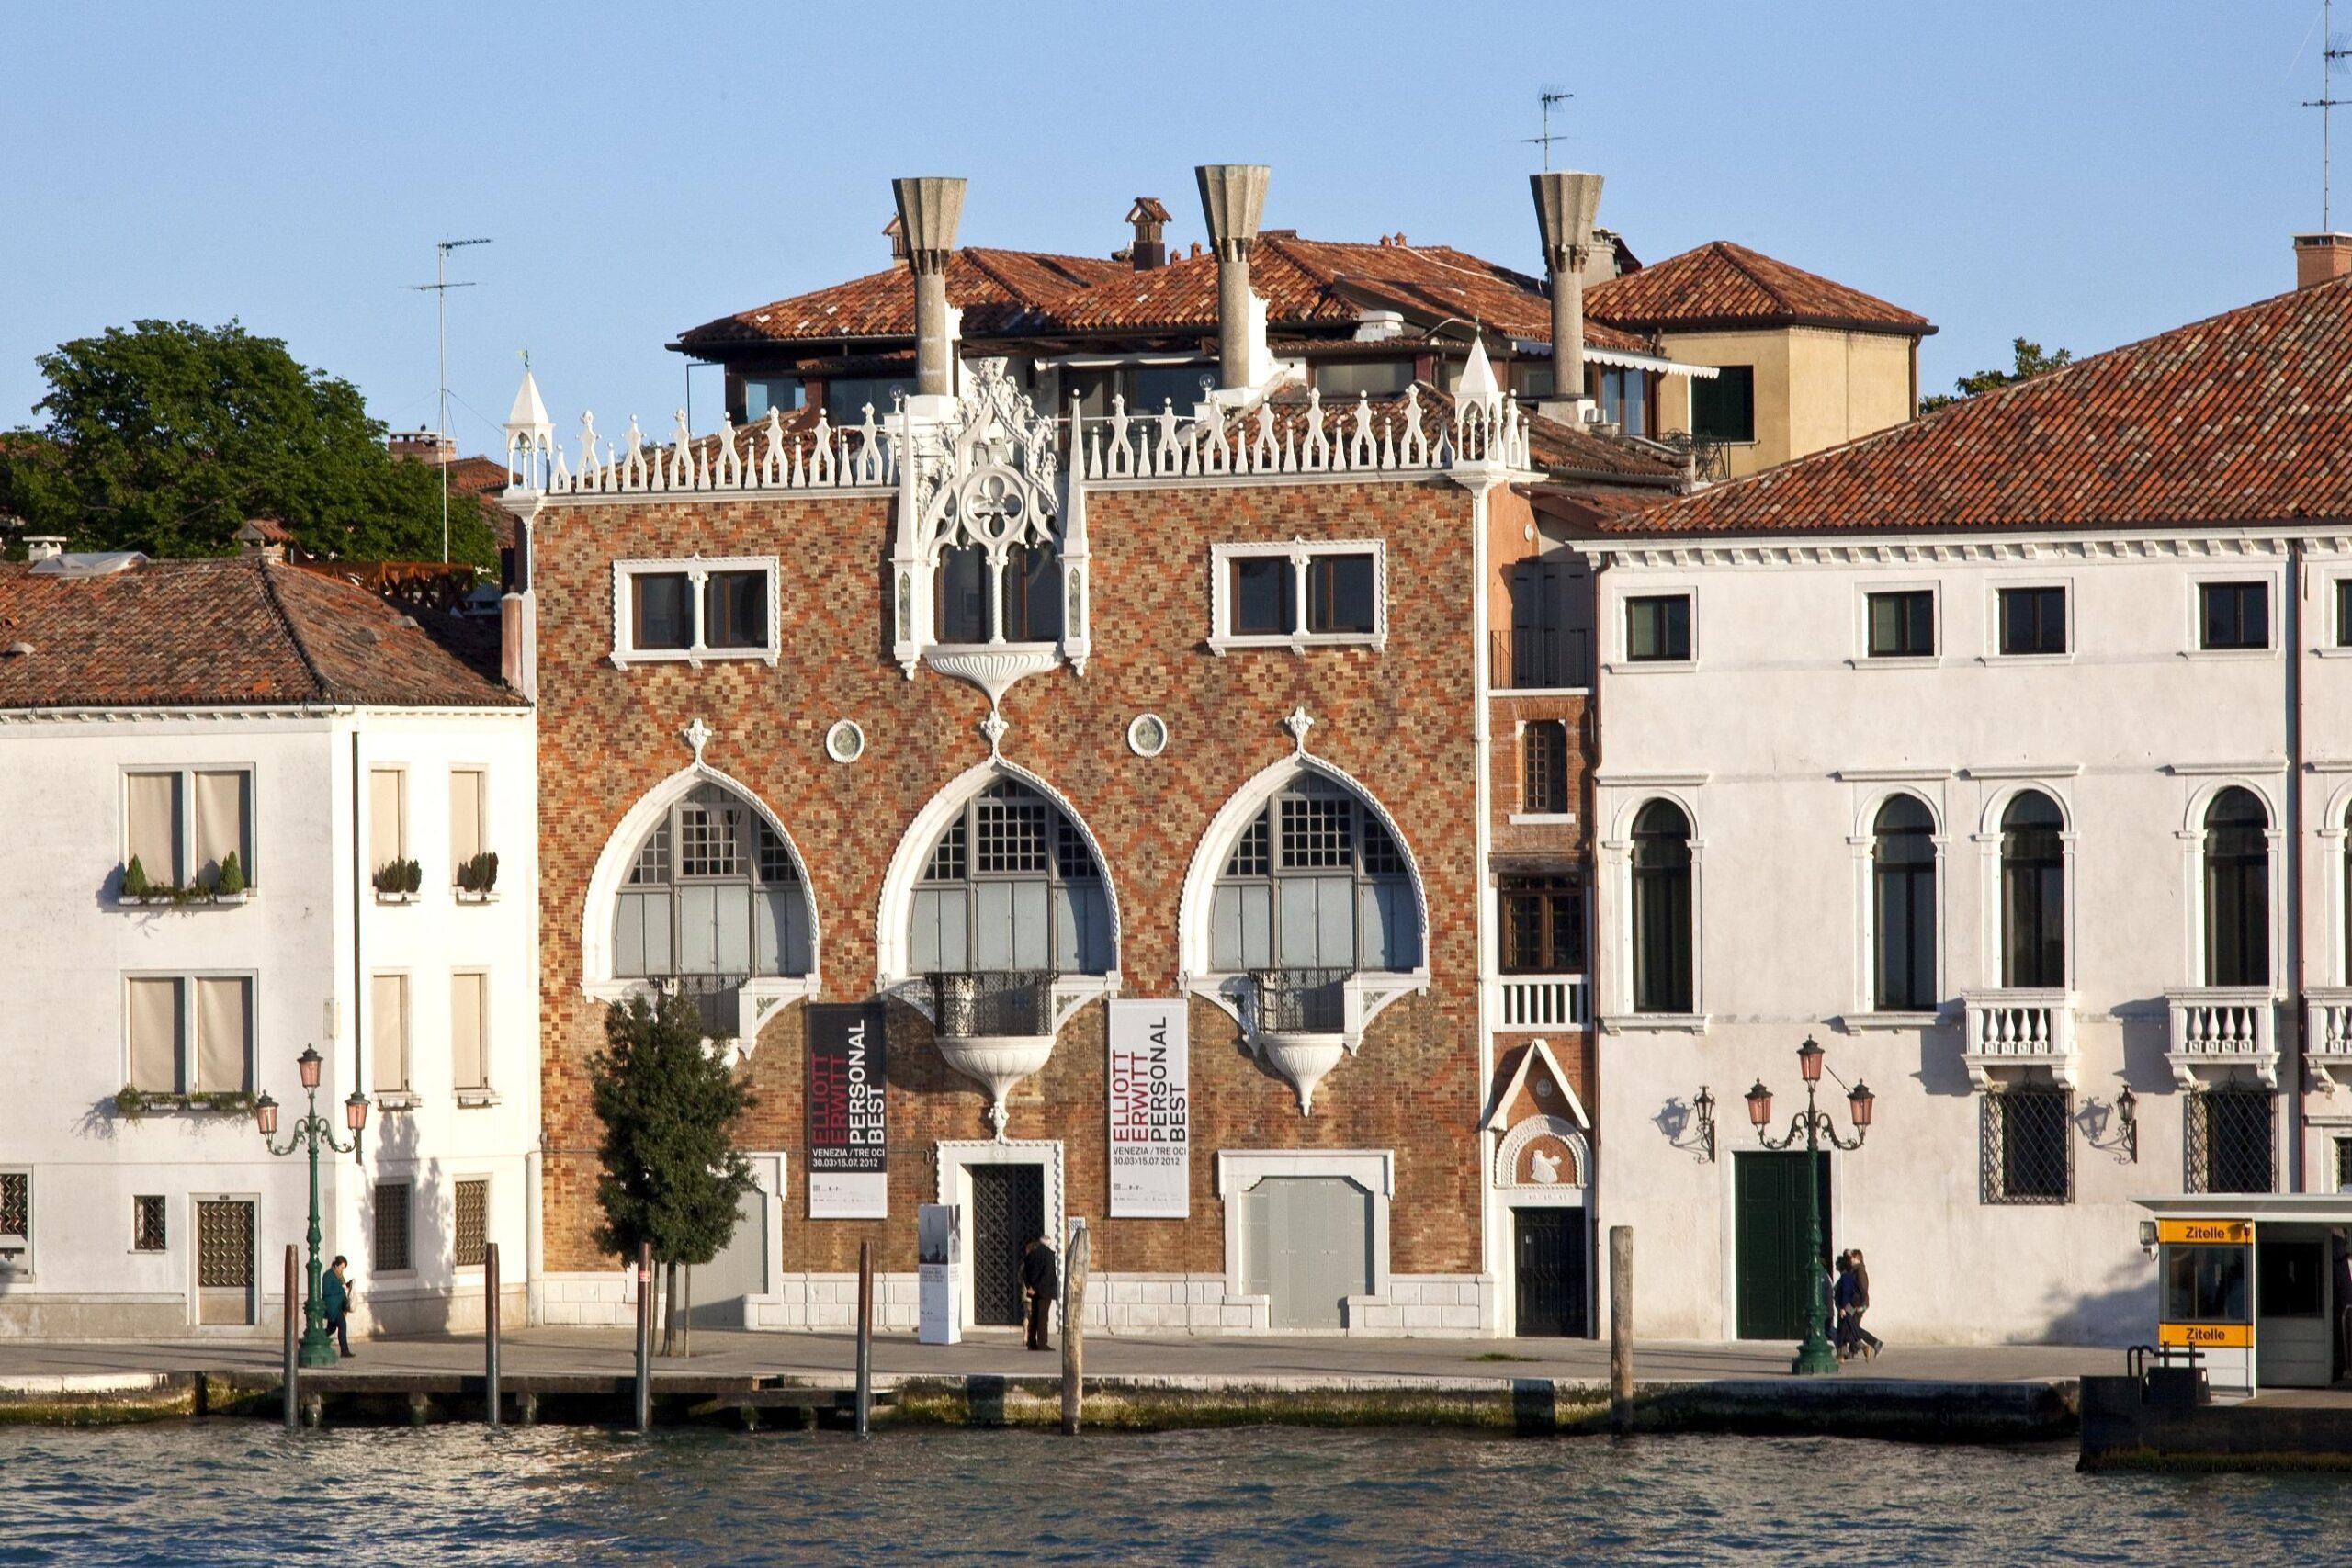 Venezia vende la Casa dei Tre Oci al filantropo e mecenate Nicolas Berggruen